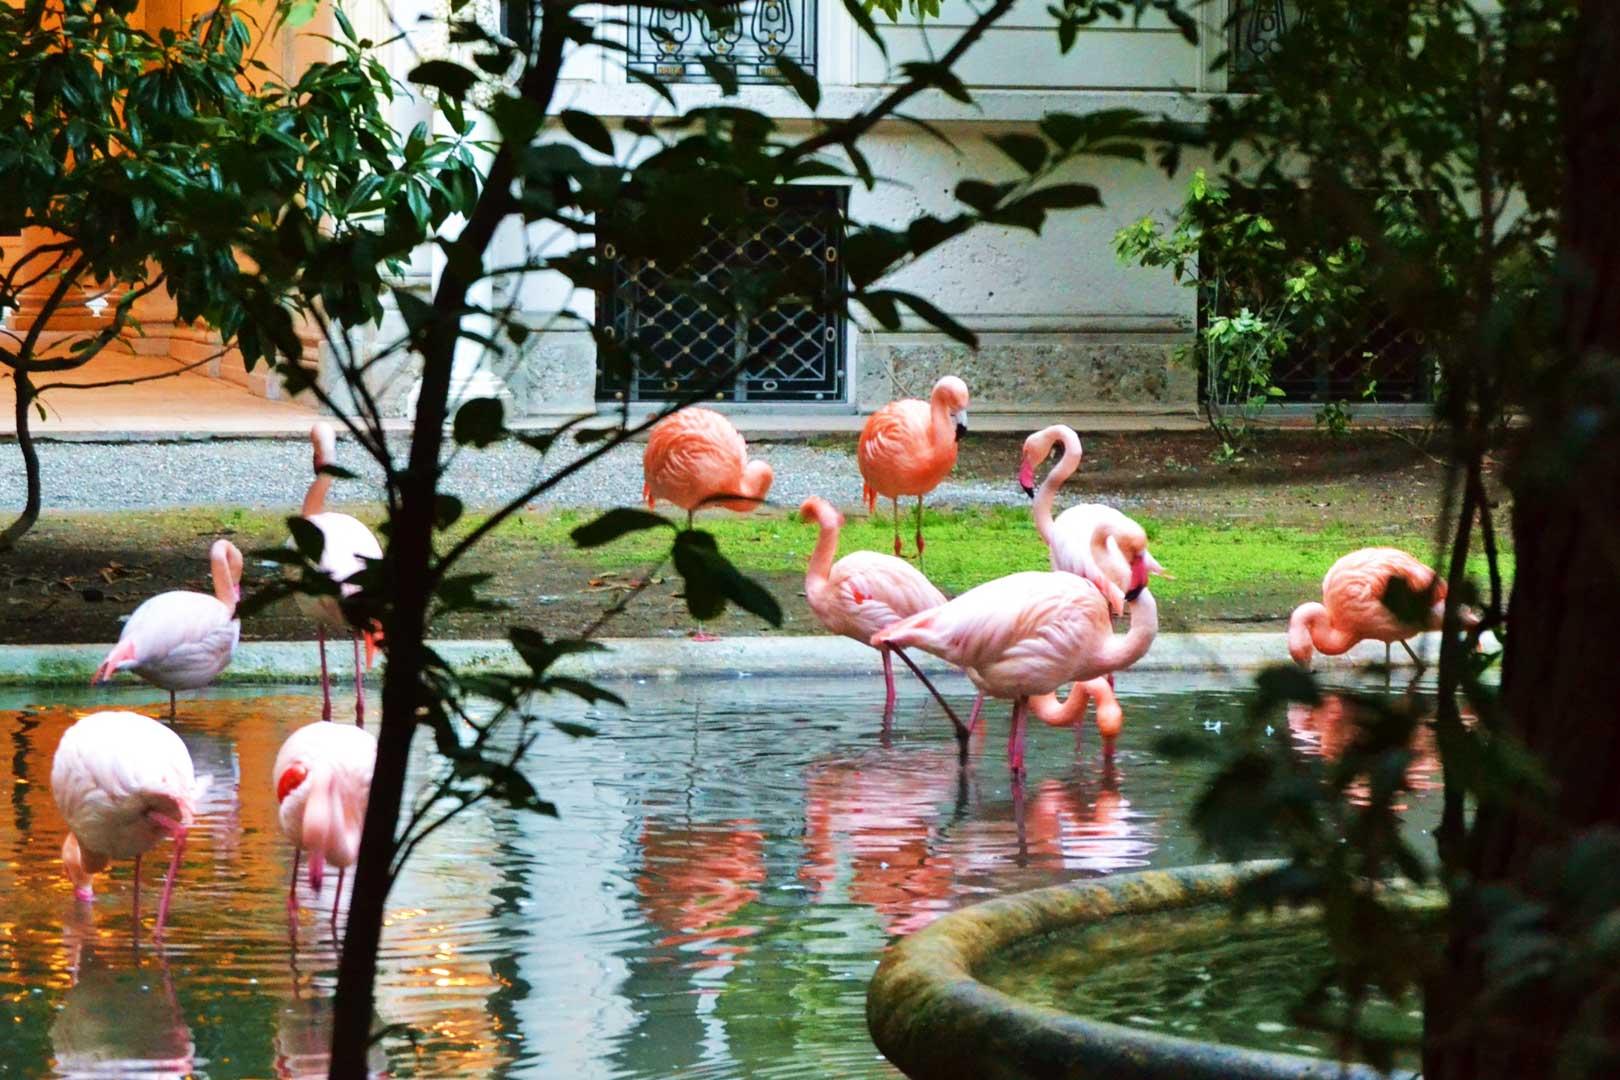 Flamingo In Huis : Pink flamingos villa invernizzi flawless milano